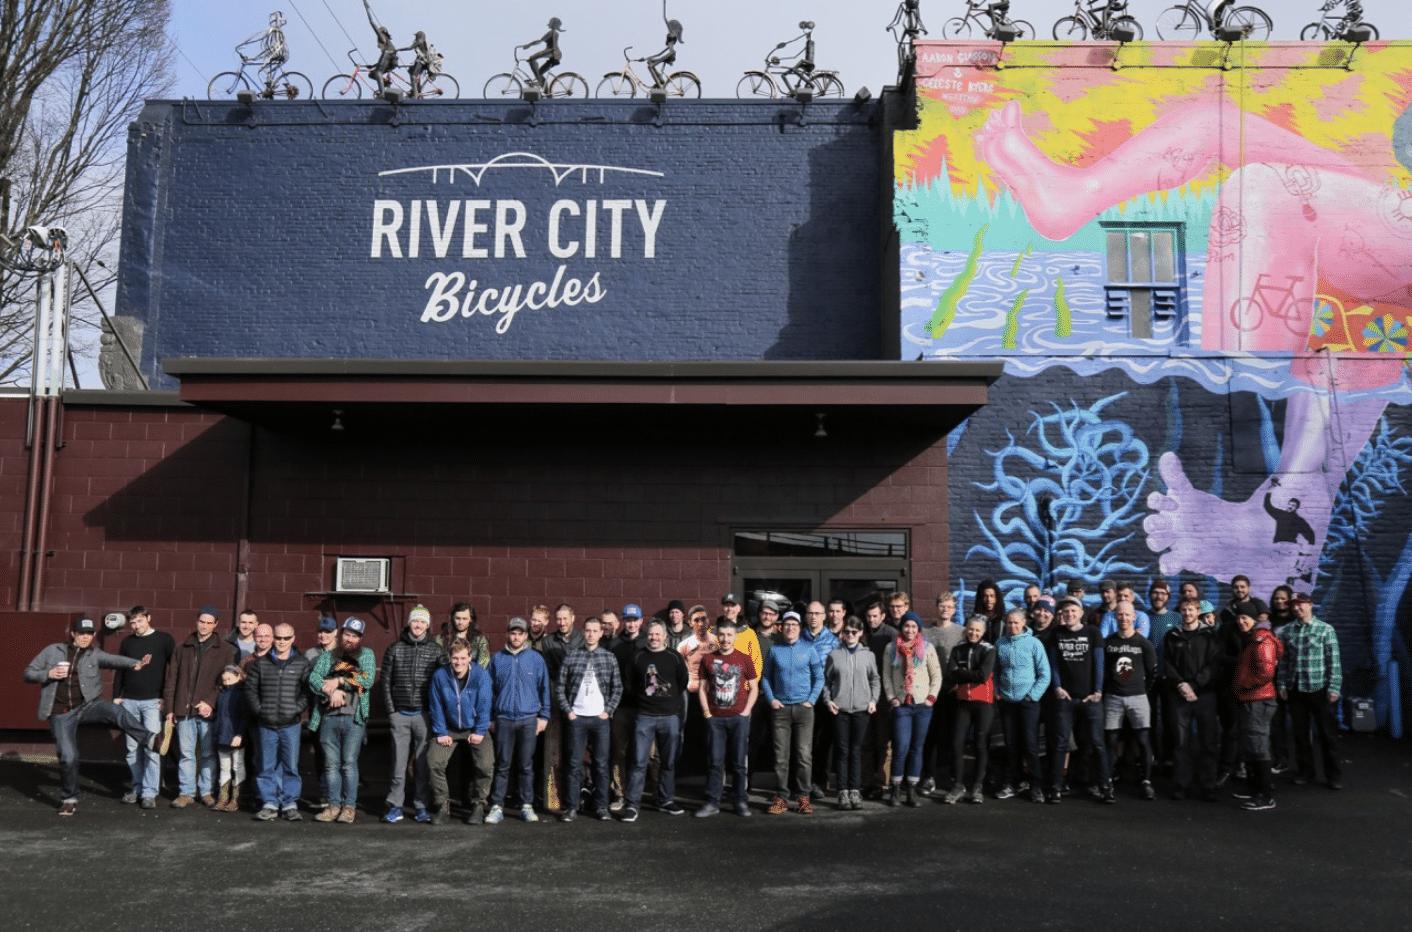 River City Bicycles / Bike Law